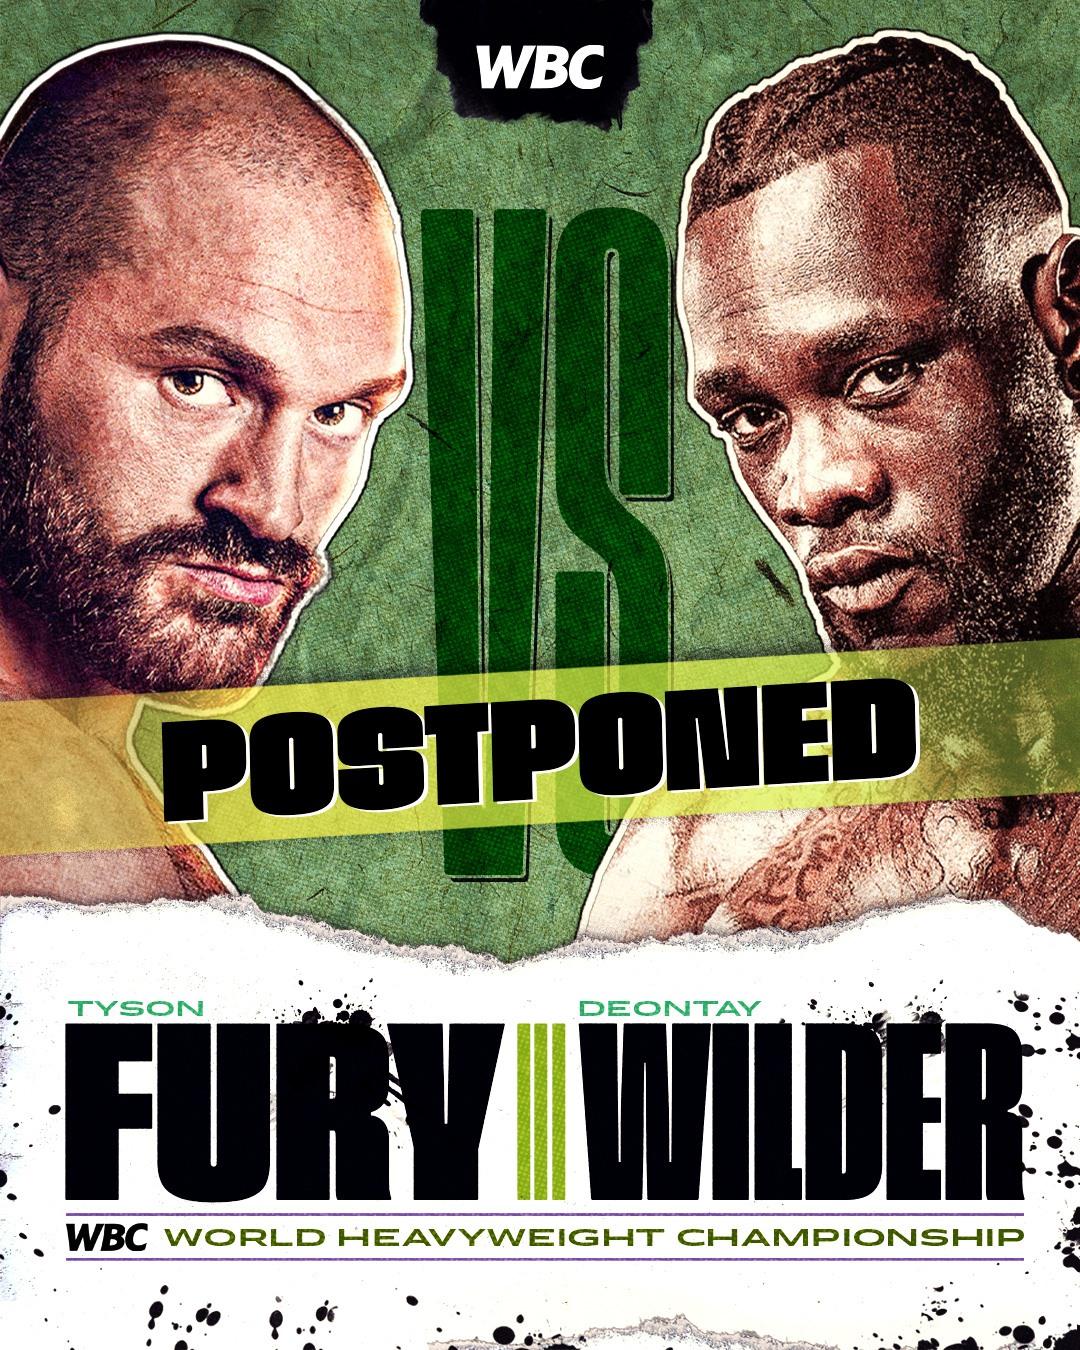 https://suljosblog.com/suljos/wp-content/uploads/2021/07/fury-wilder-postponed.jpg